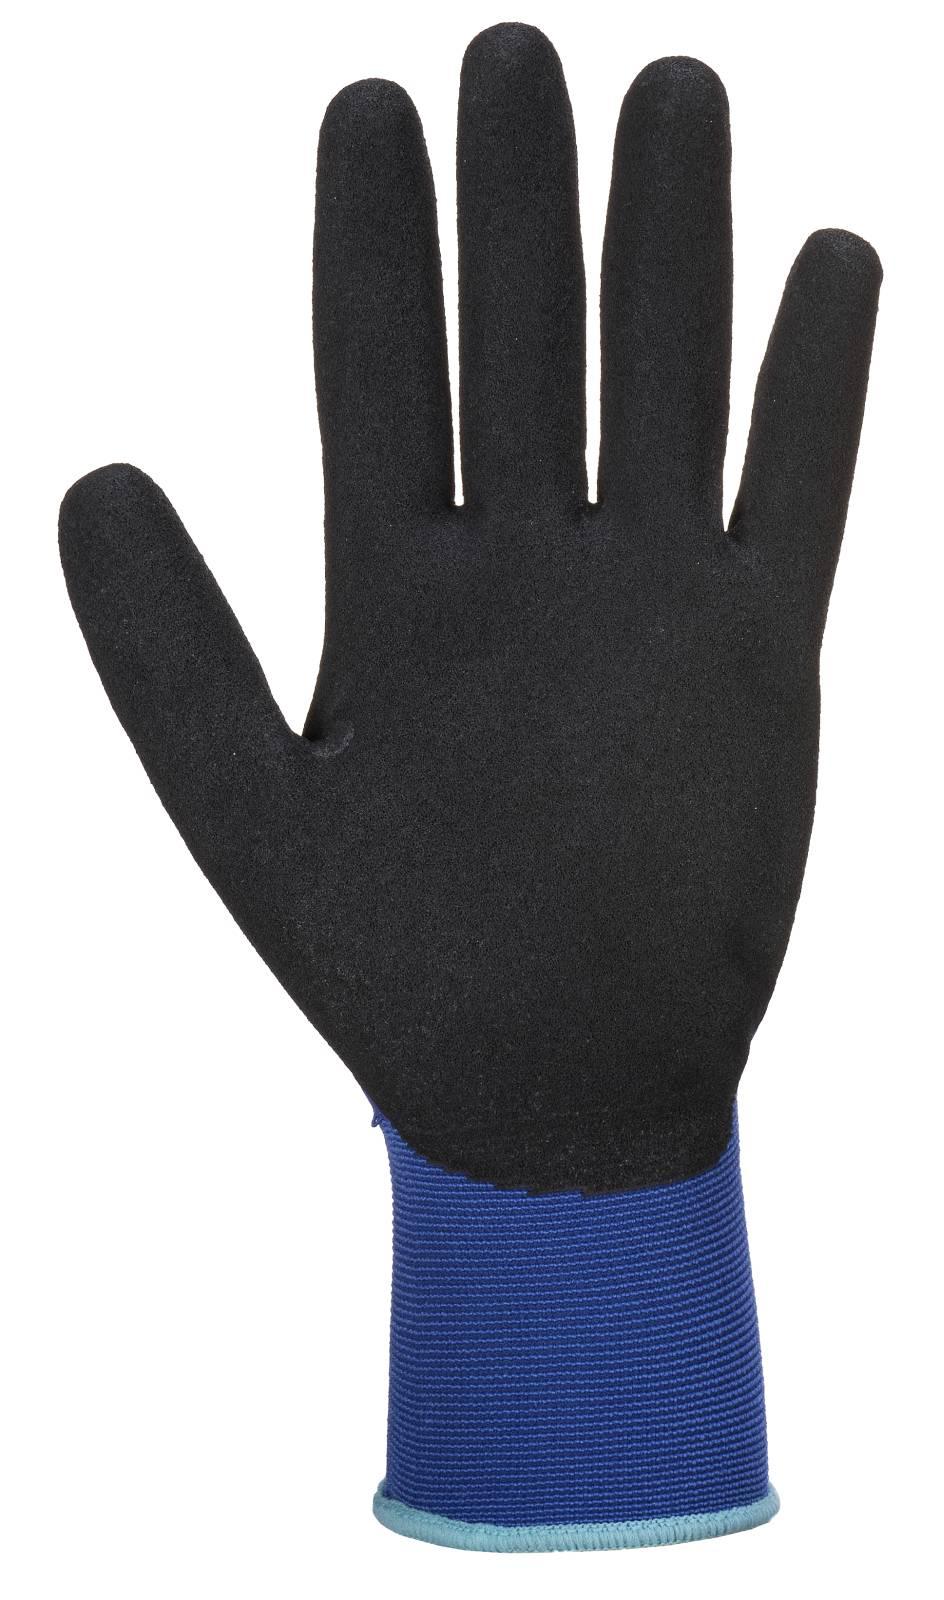 Portwest Handschoenen AP70 blauw-zwart(B8)